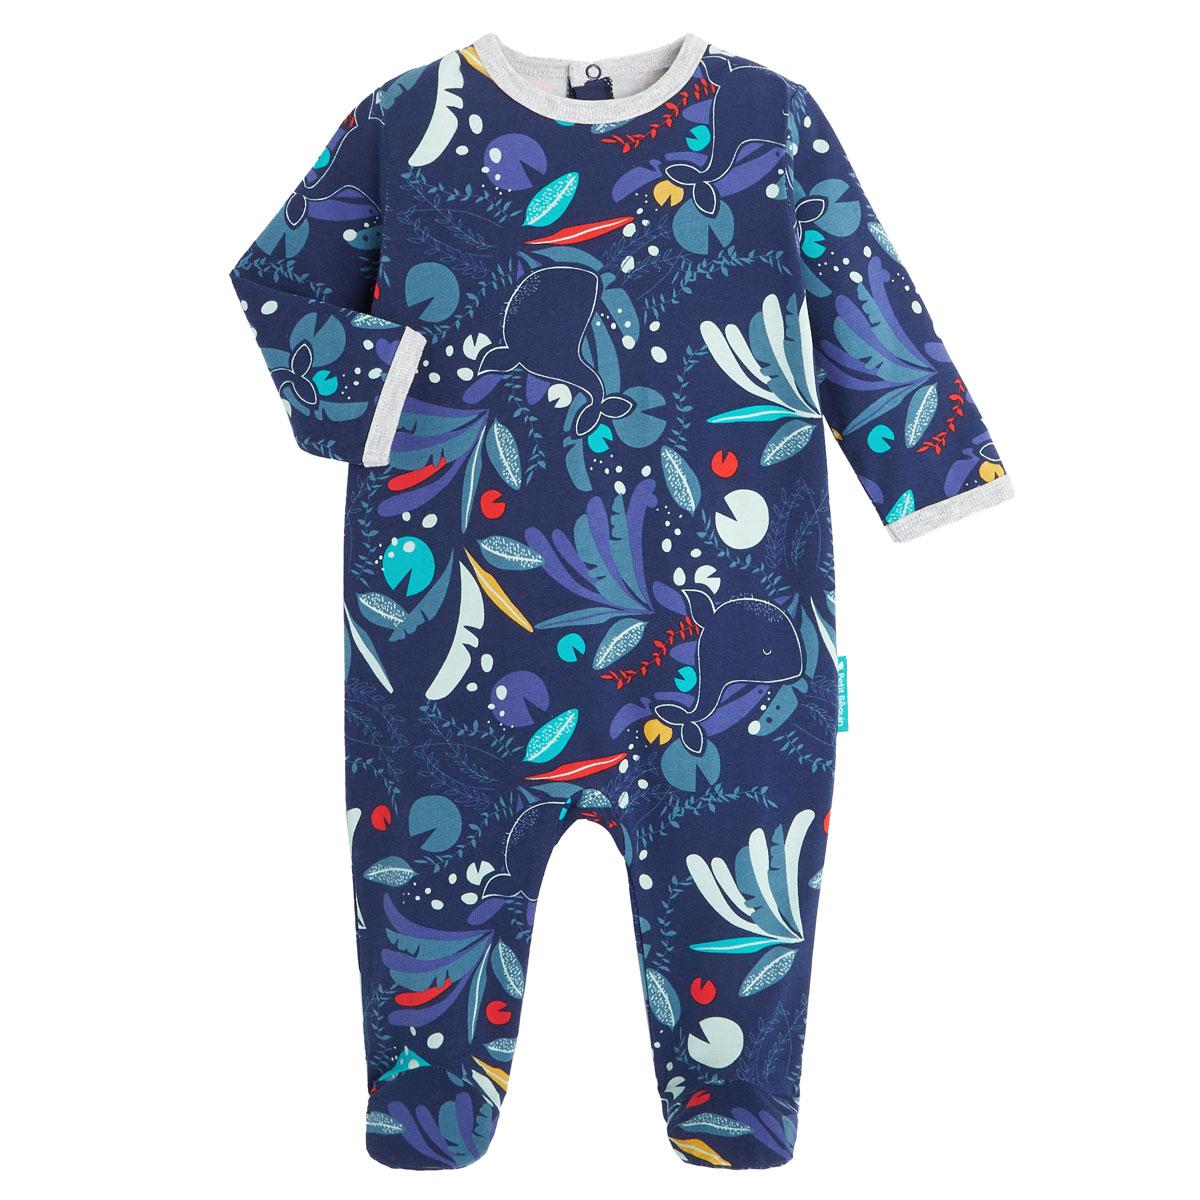 Pyjama bébé contenant du coton bio Sea You